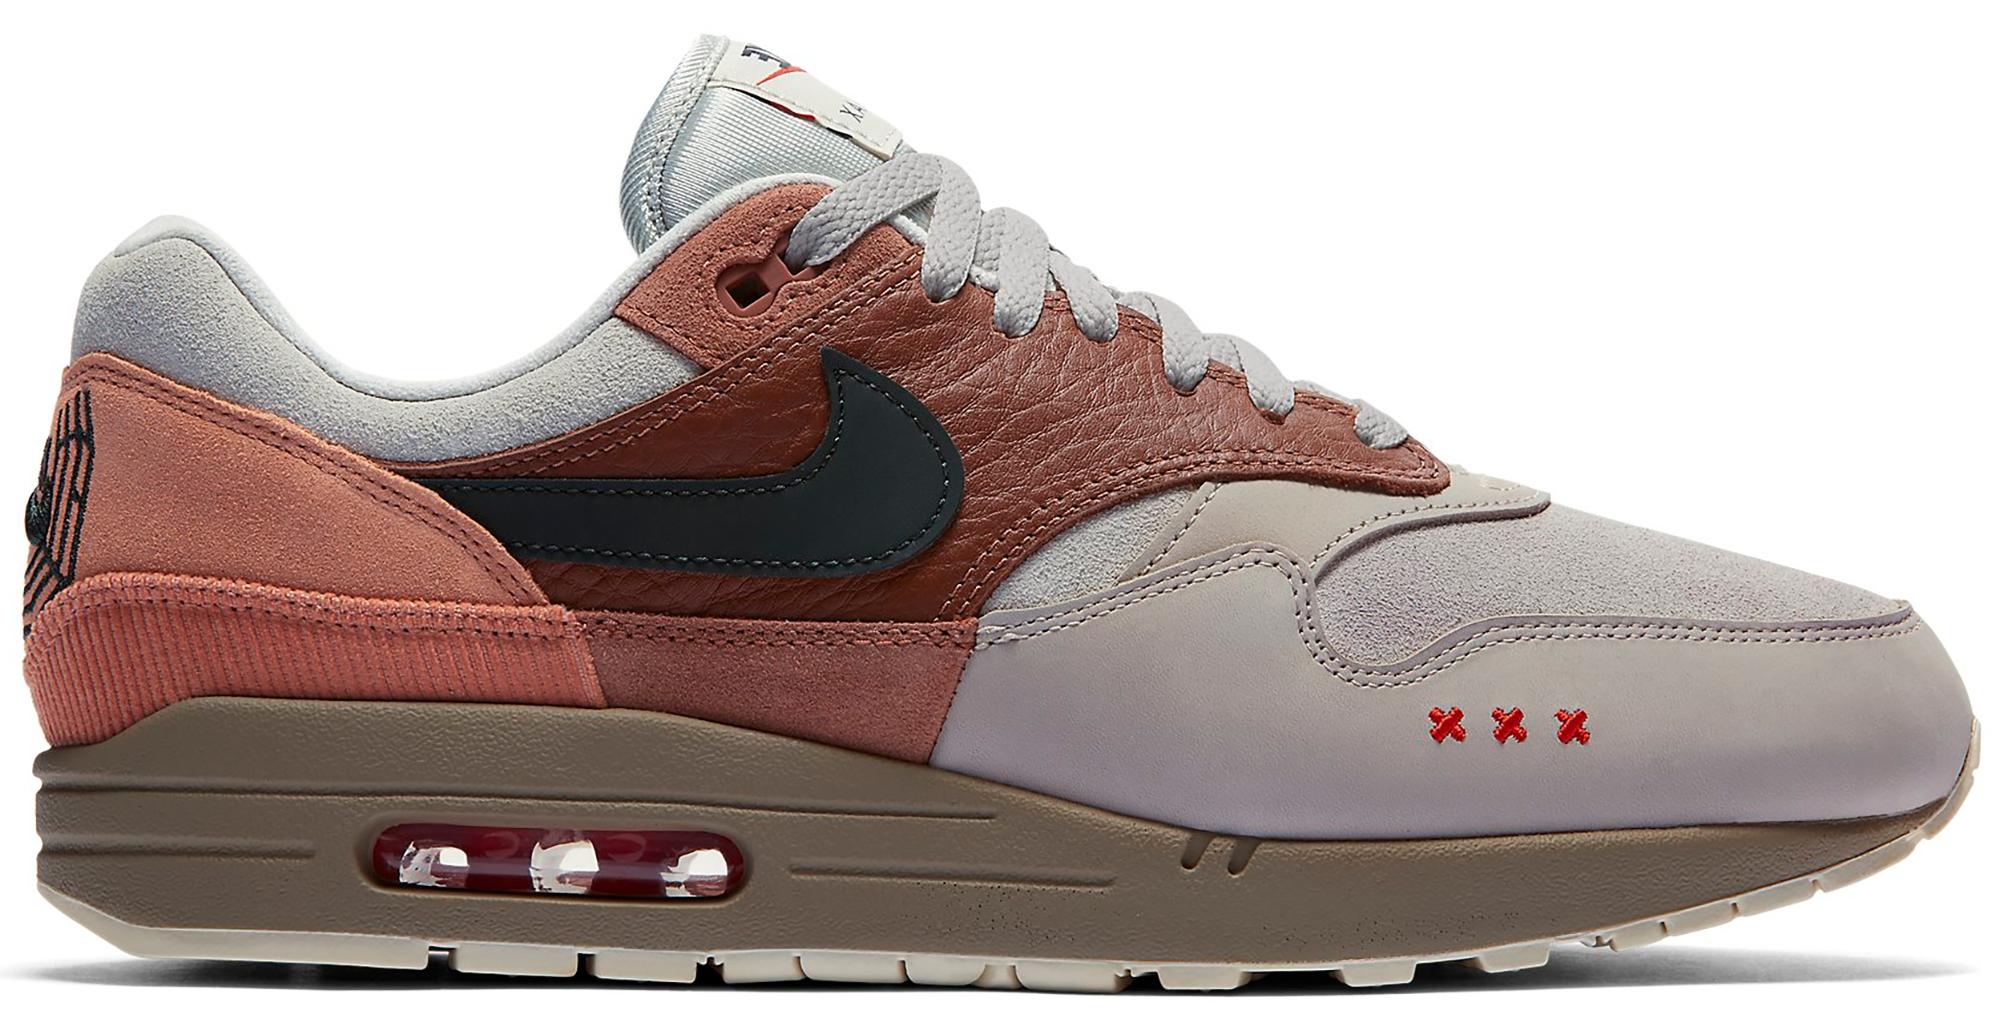 Buy Nike Air Max 1 Shoes \u0026 Deadstock